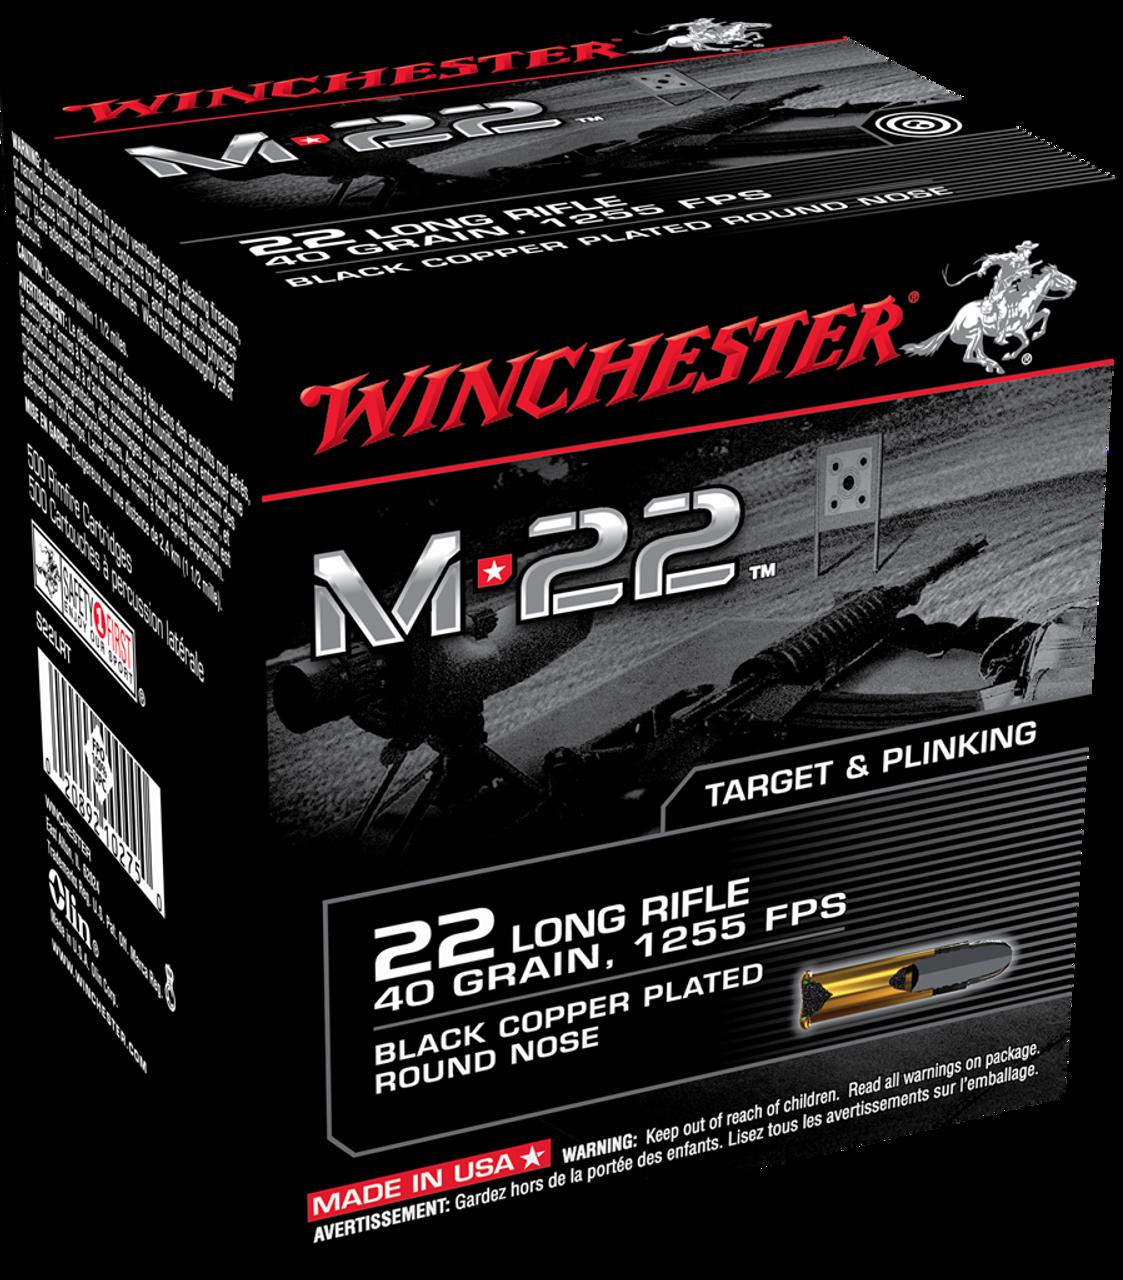 Facebook Ammunition Special - Winchester M22 - 22LR - 10 pounds